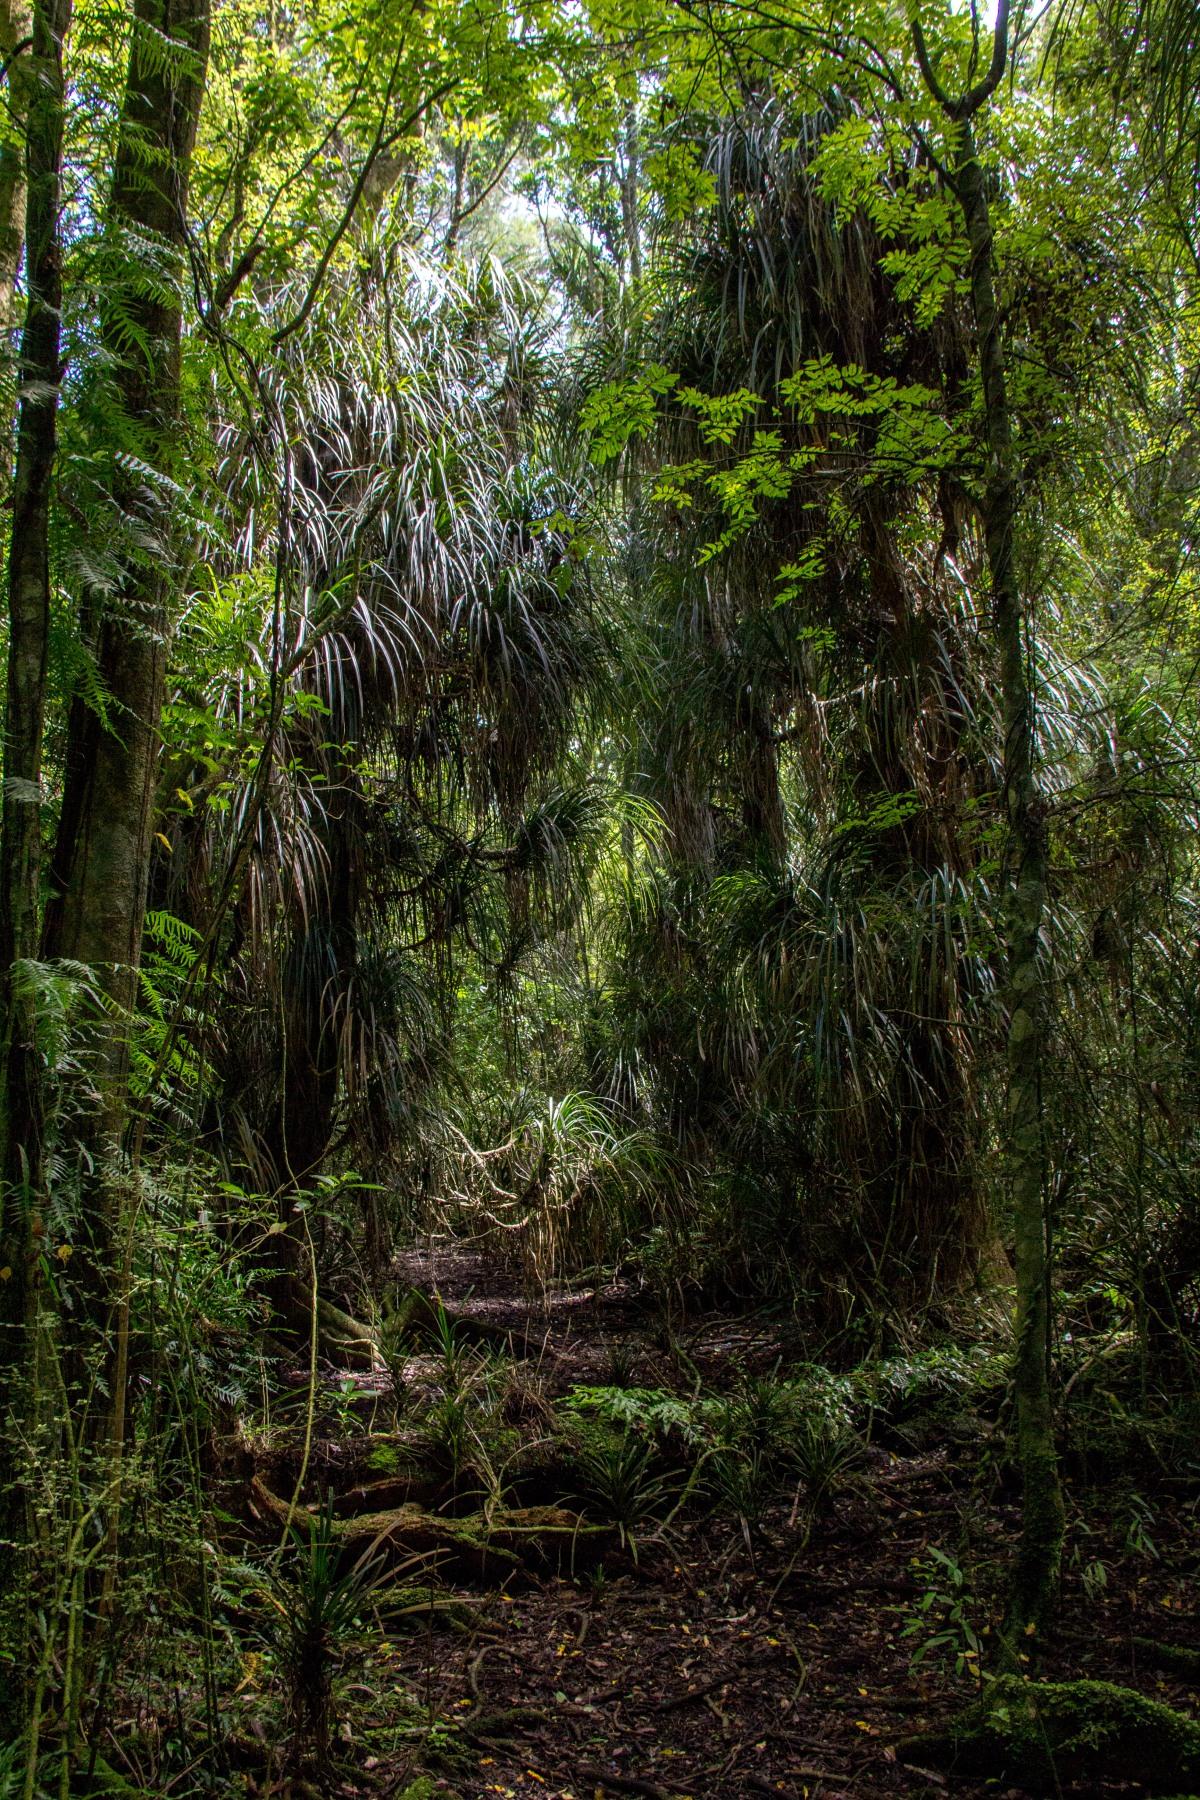 Jurassic path